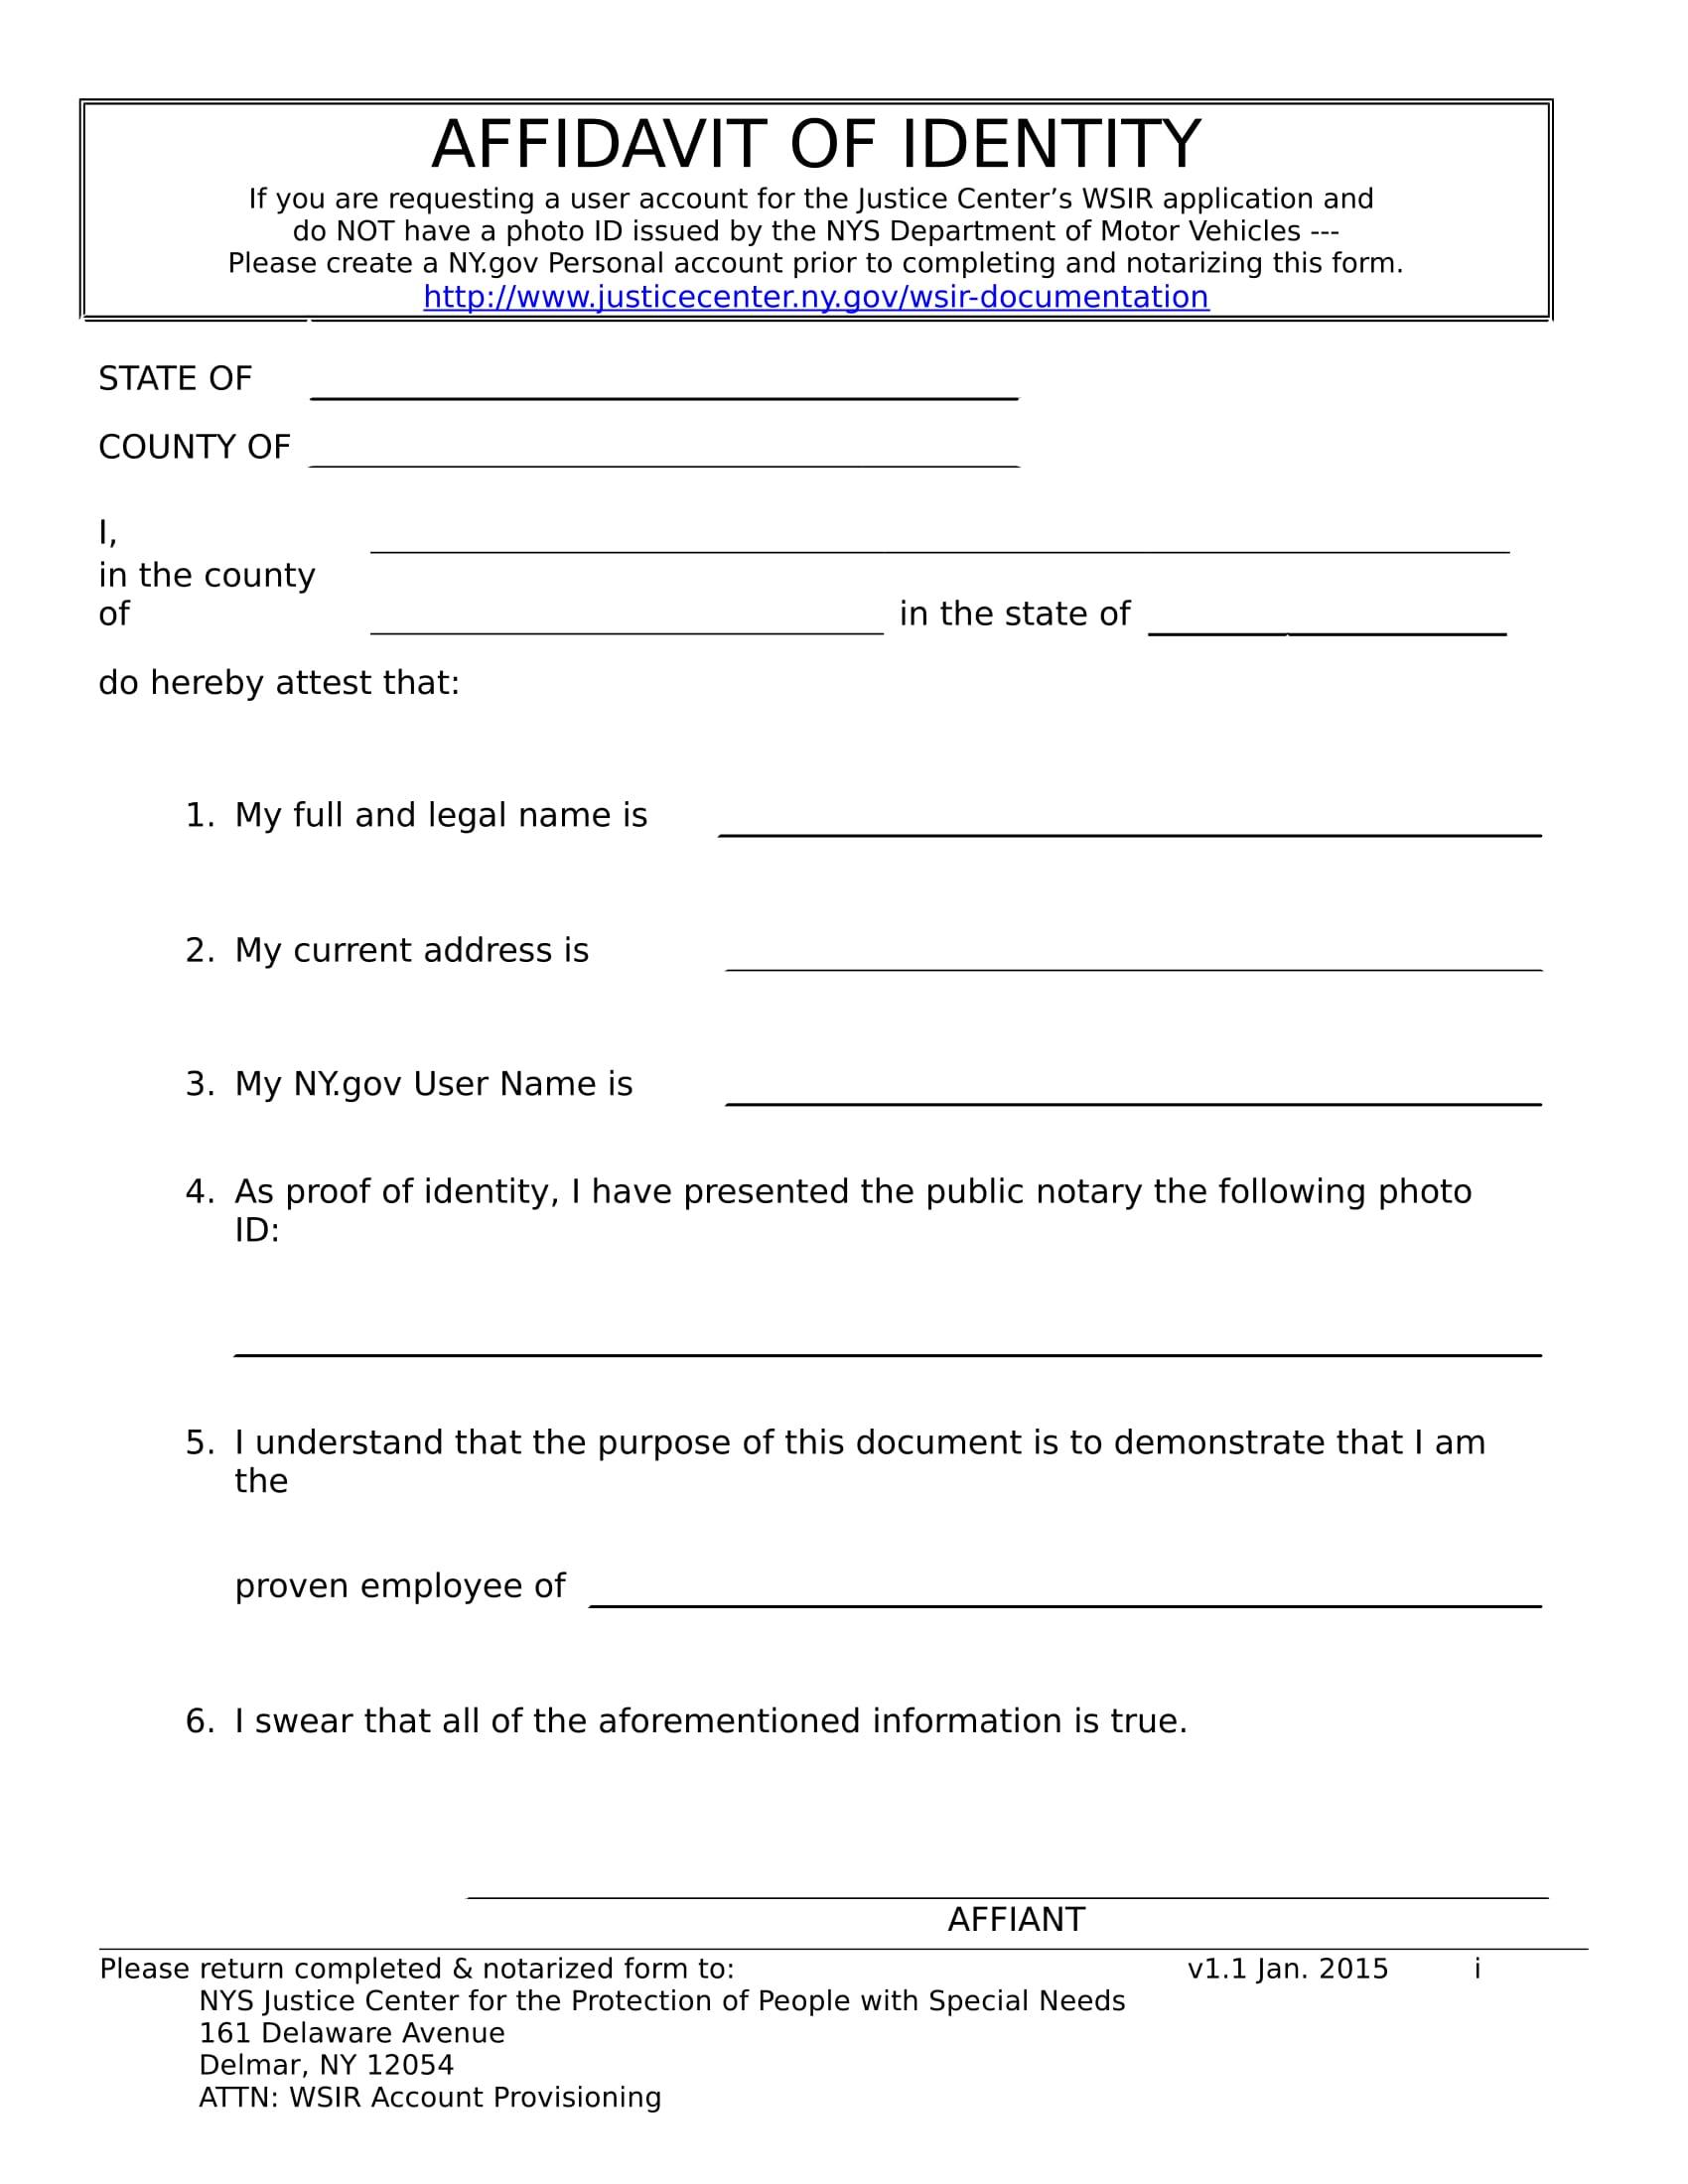 identity affidavit form sample 1